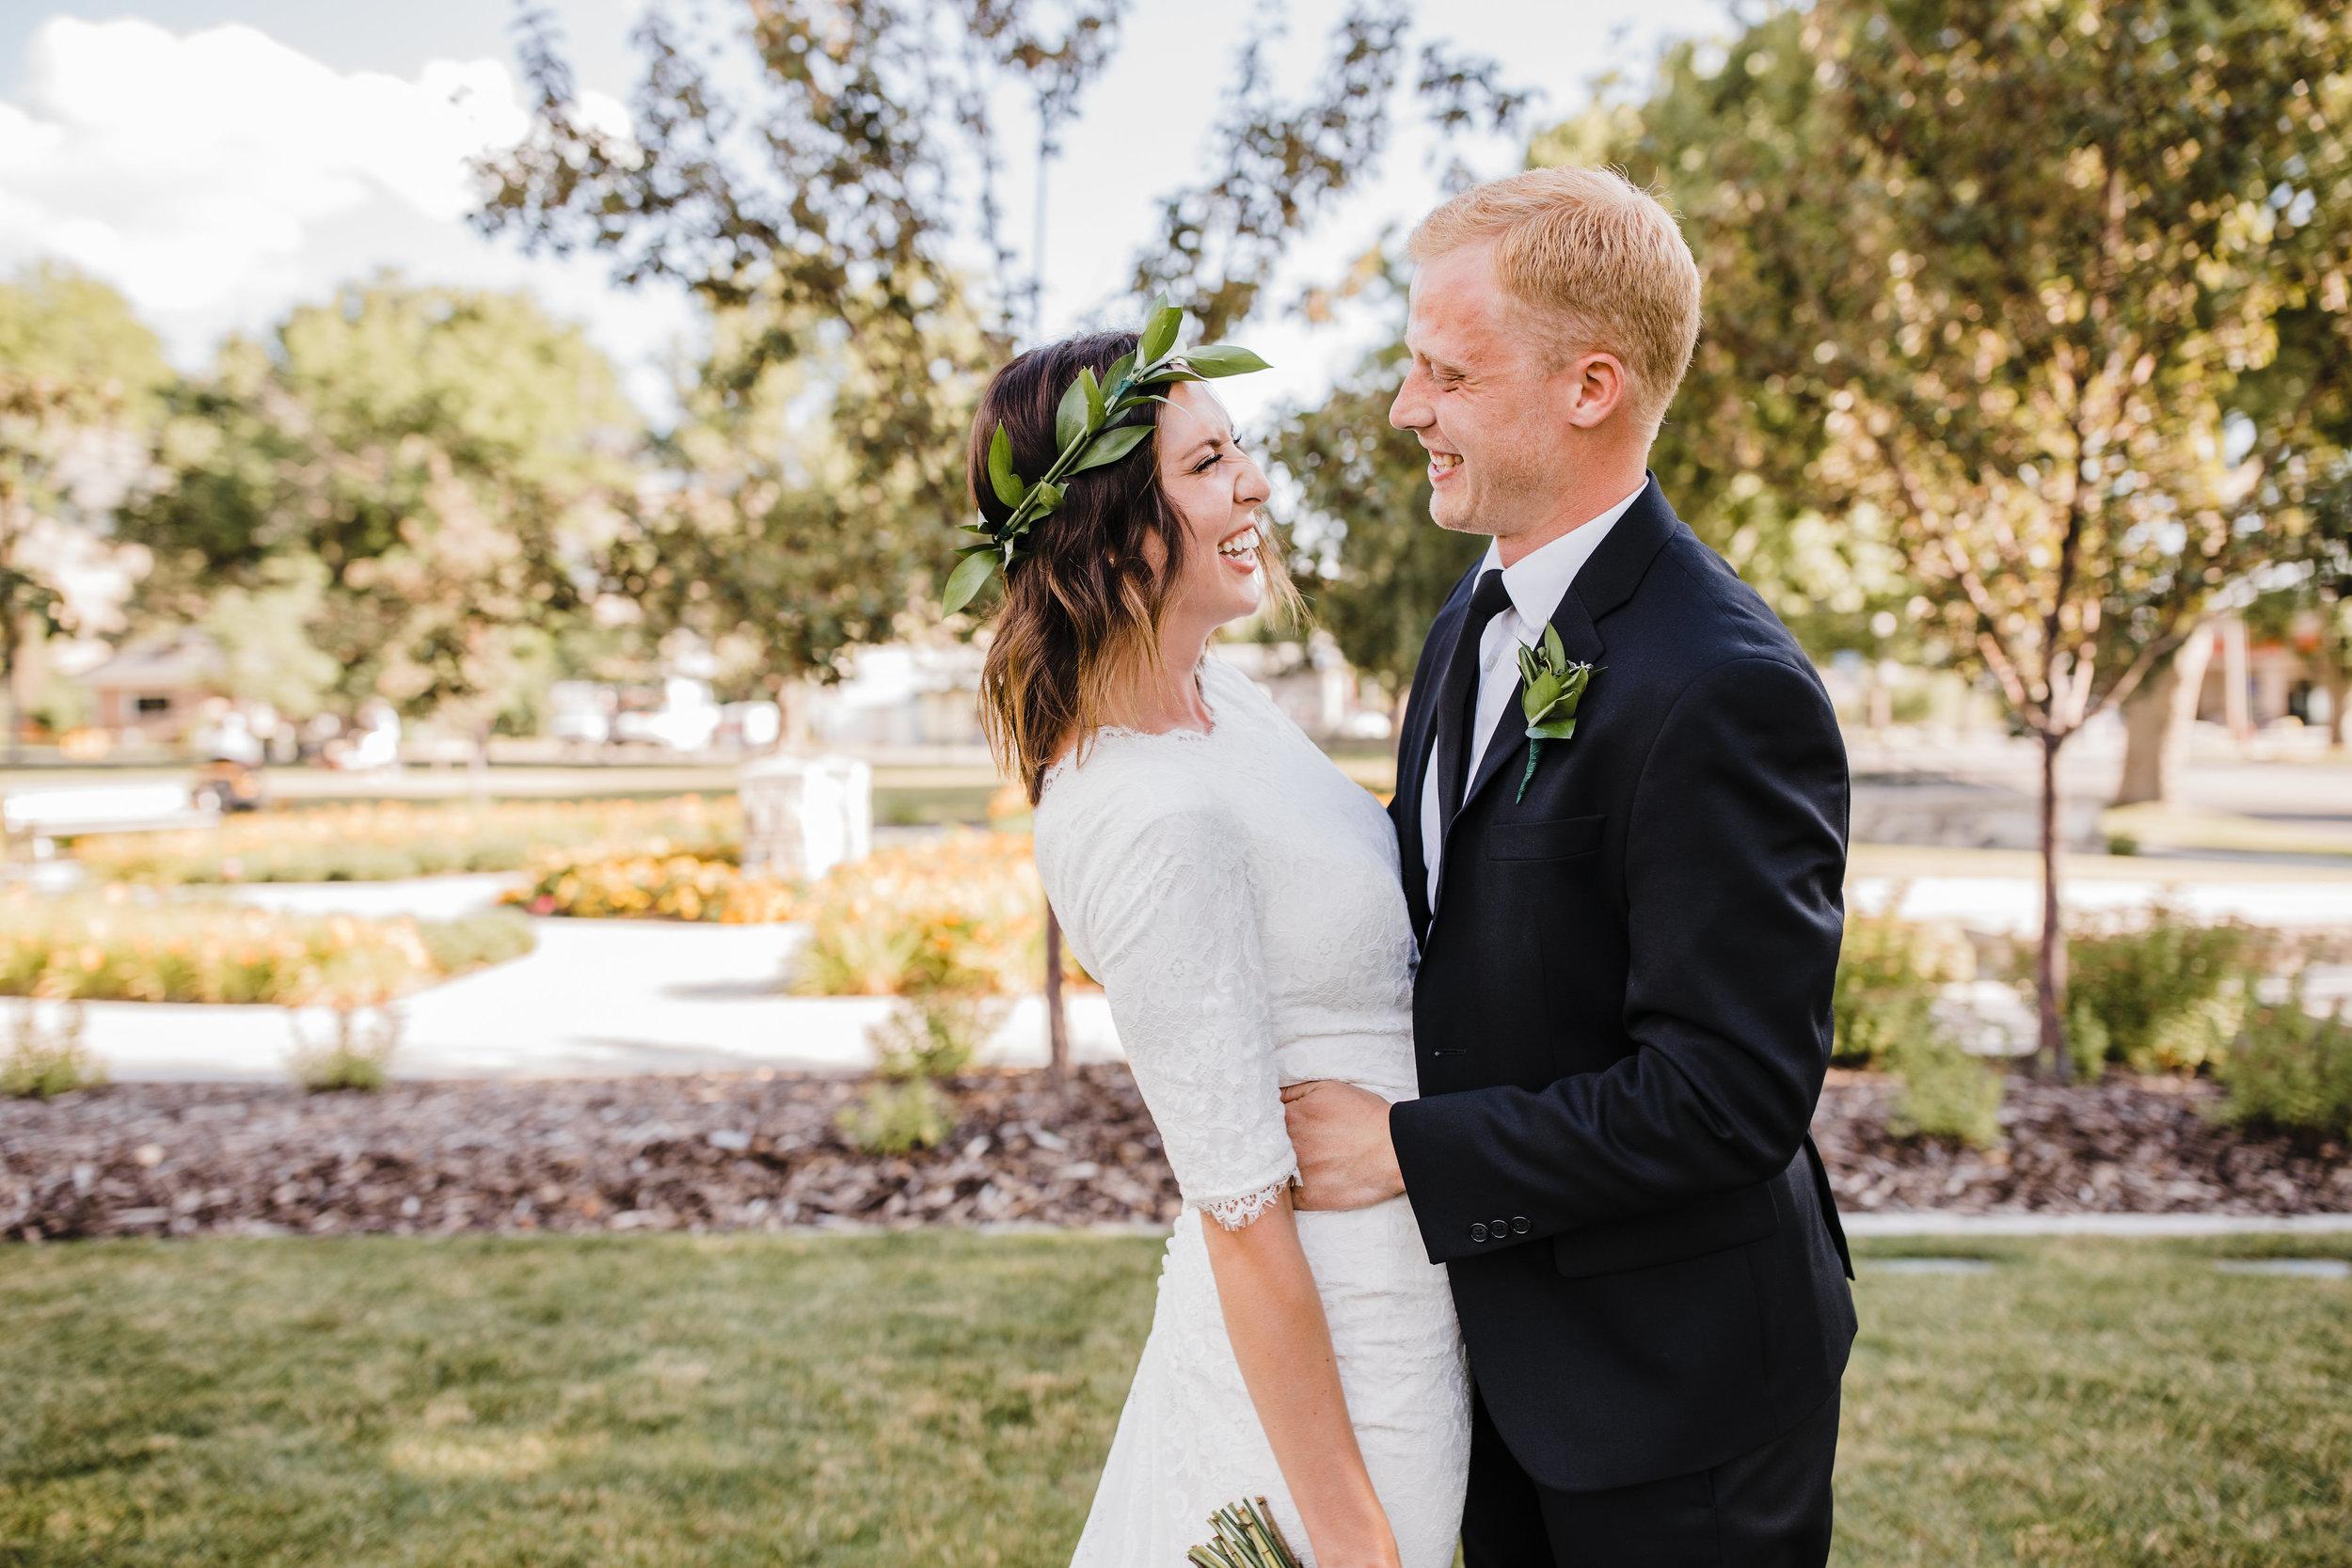 brigham city wedding photographer bridals lds first look modest wedding dress